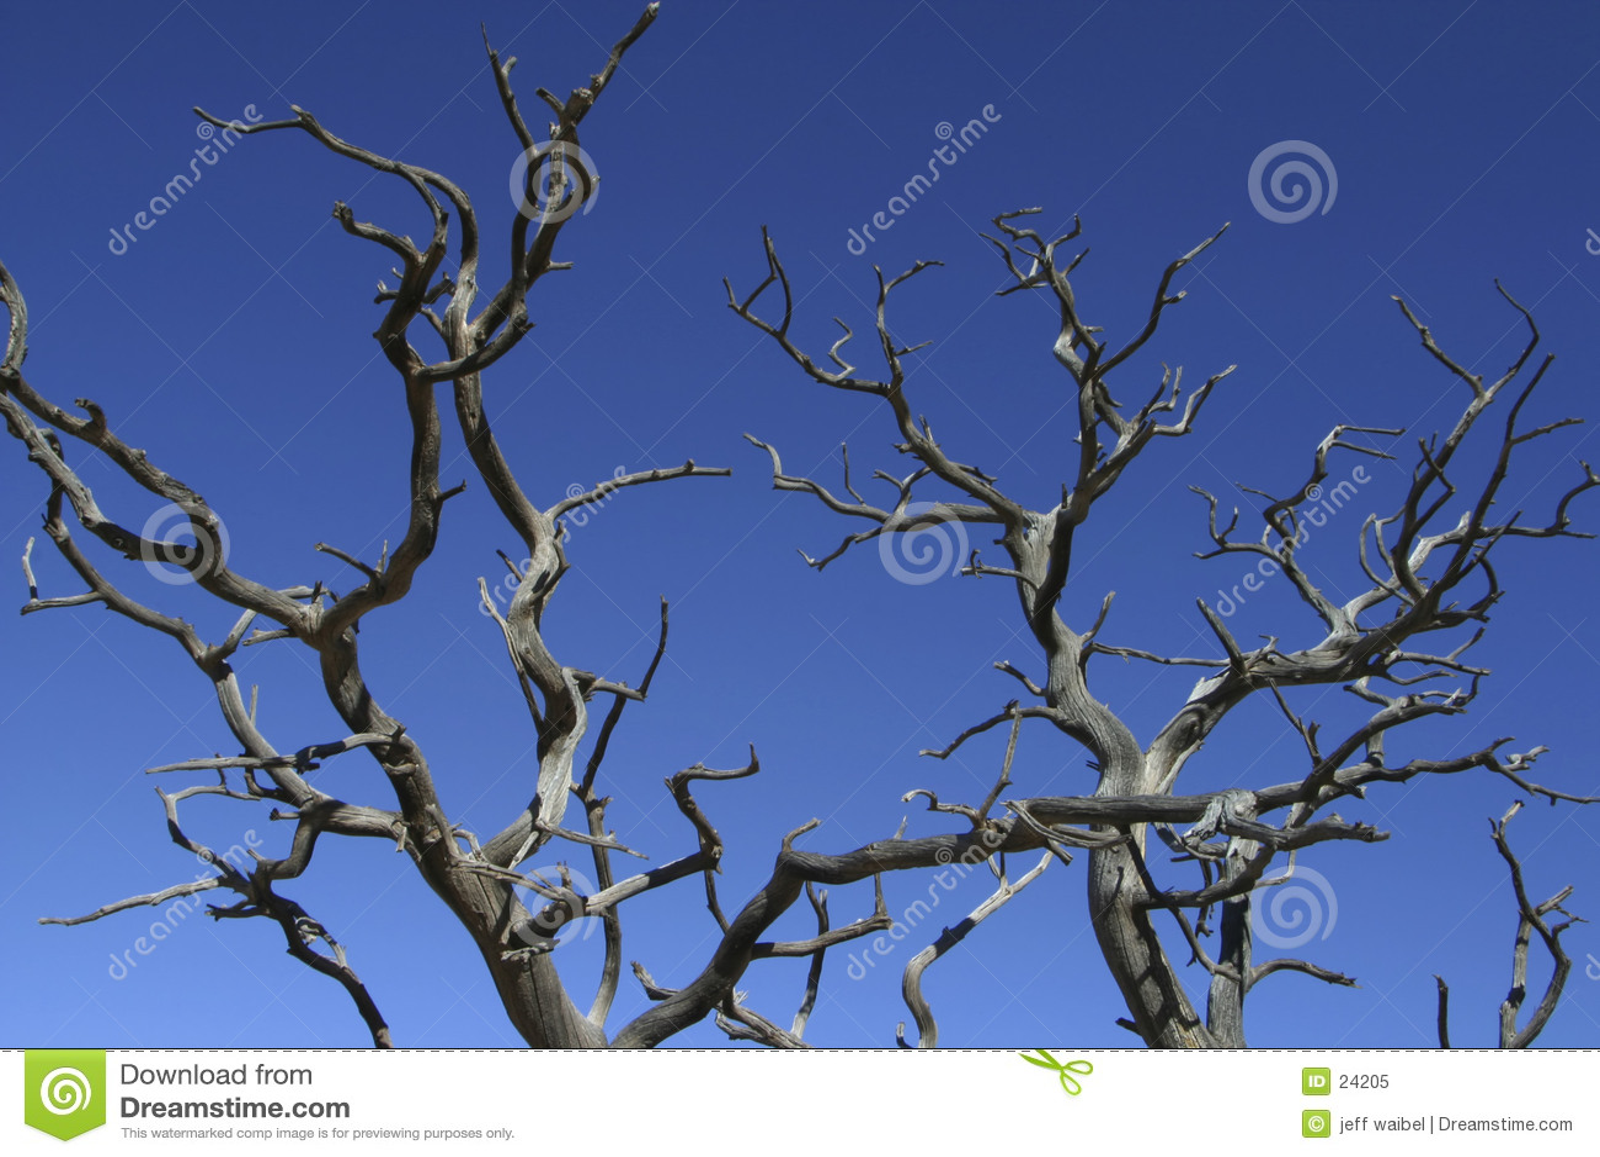 Branches reach skyward